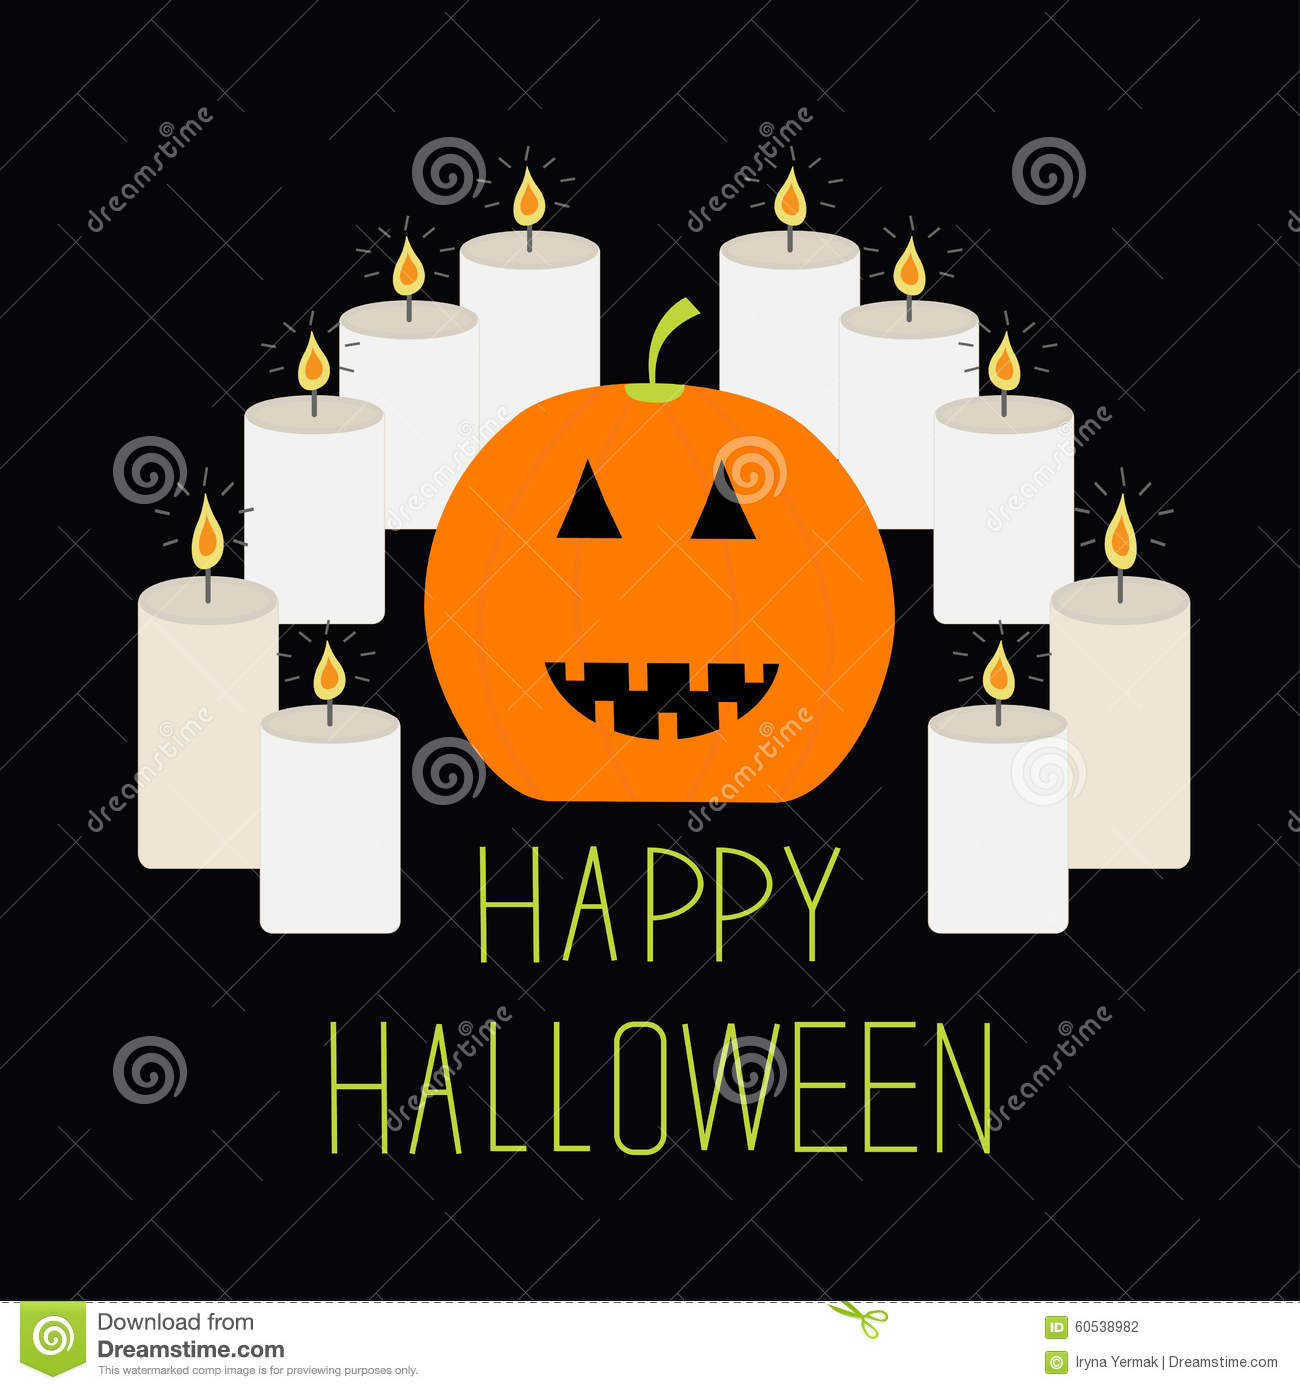 Cute Funny Pumpkin. Candle Pyramid. Halloween Card. Flat Design.